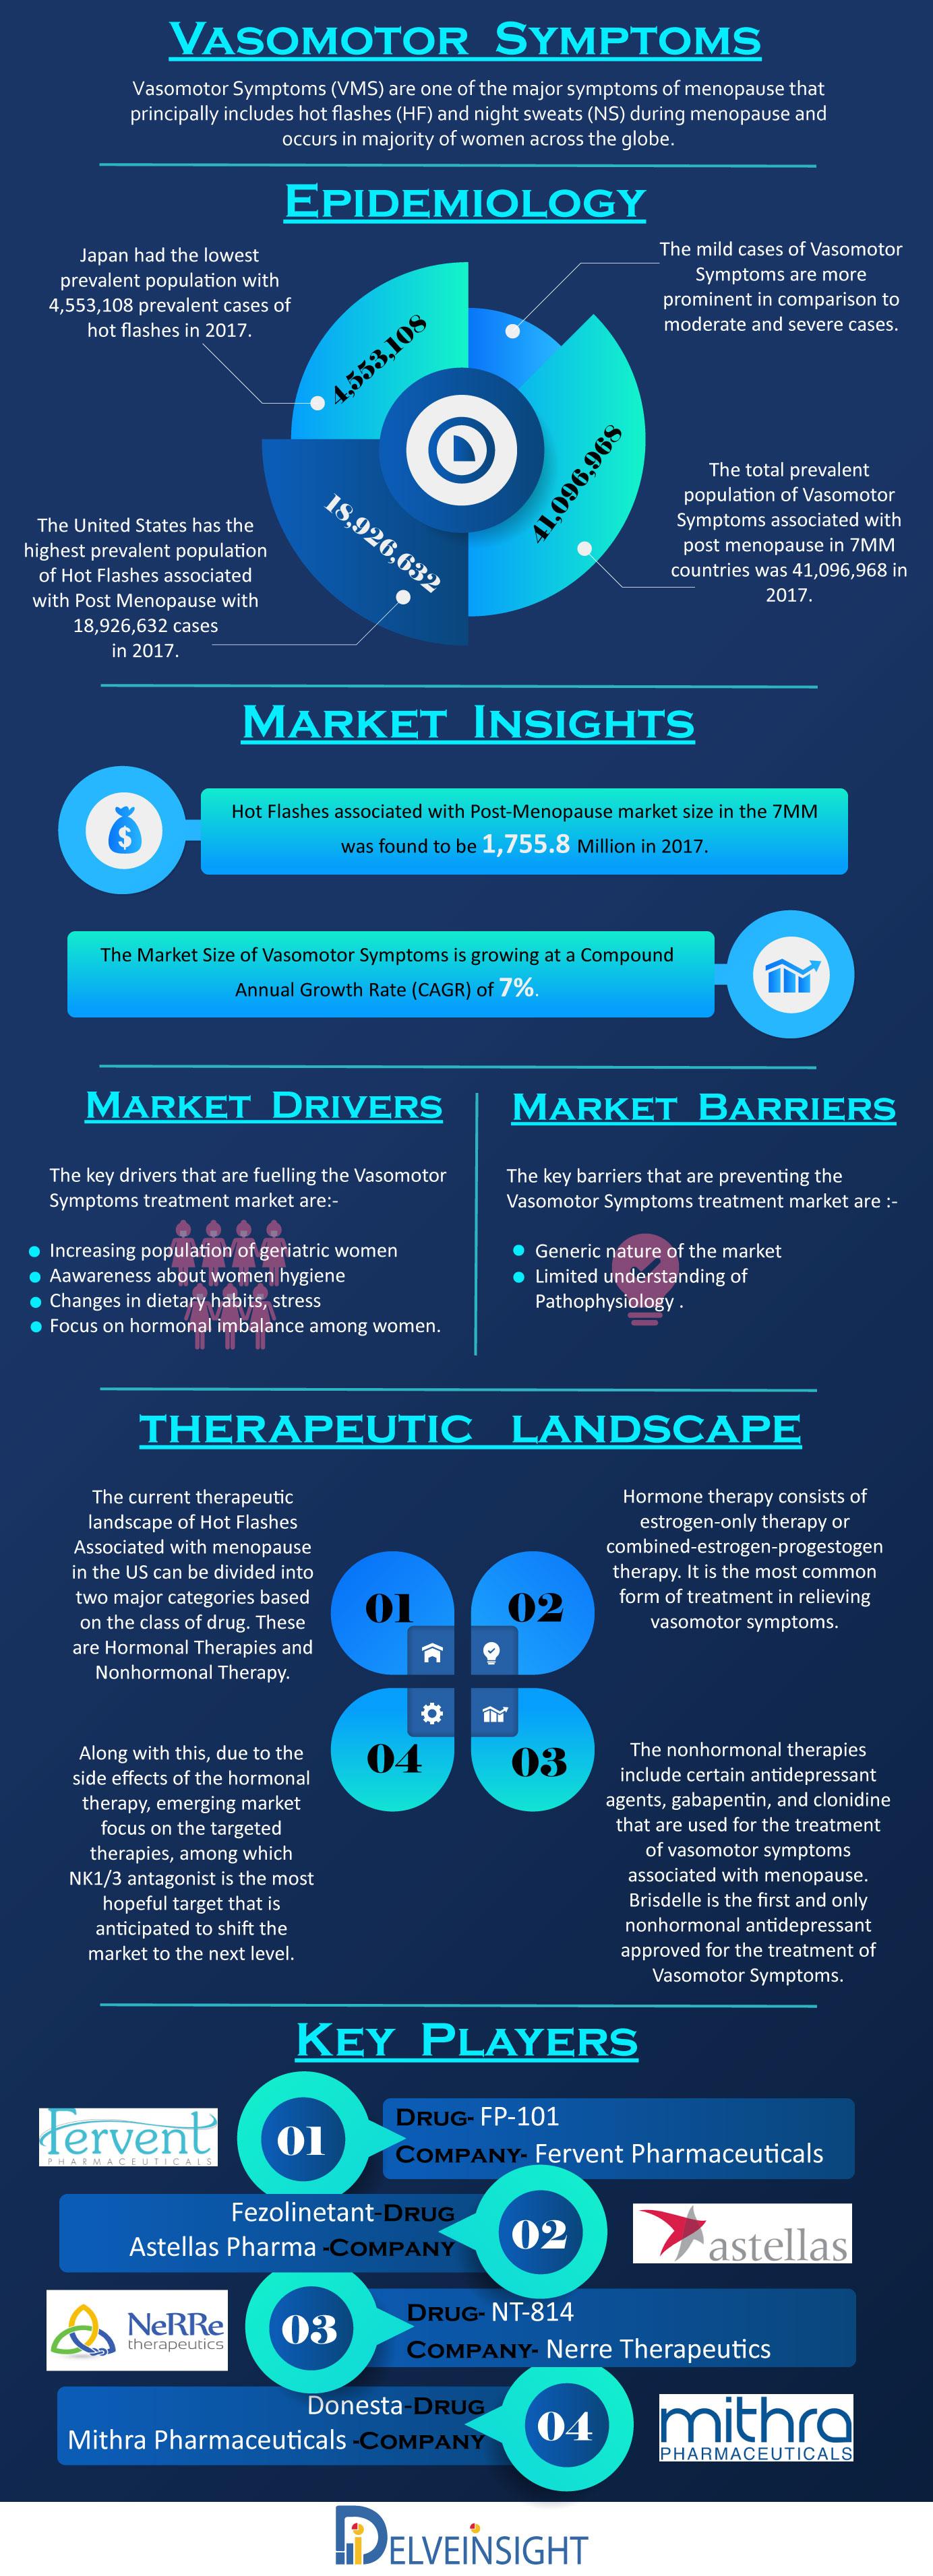 Vasomotor Symptoms Market